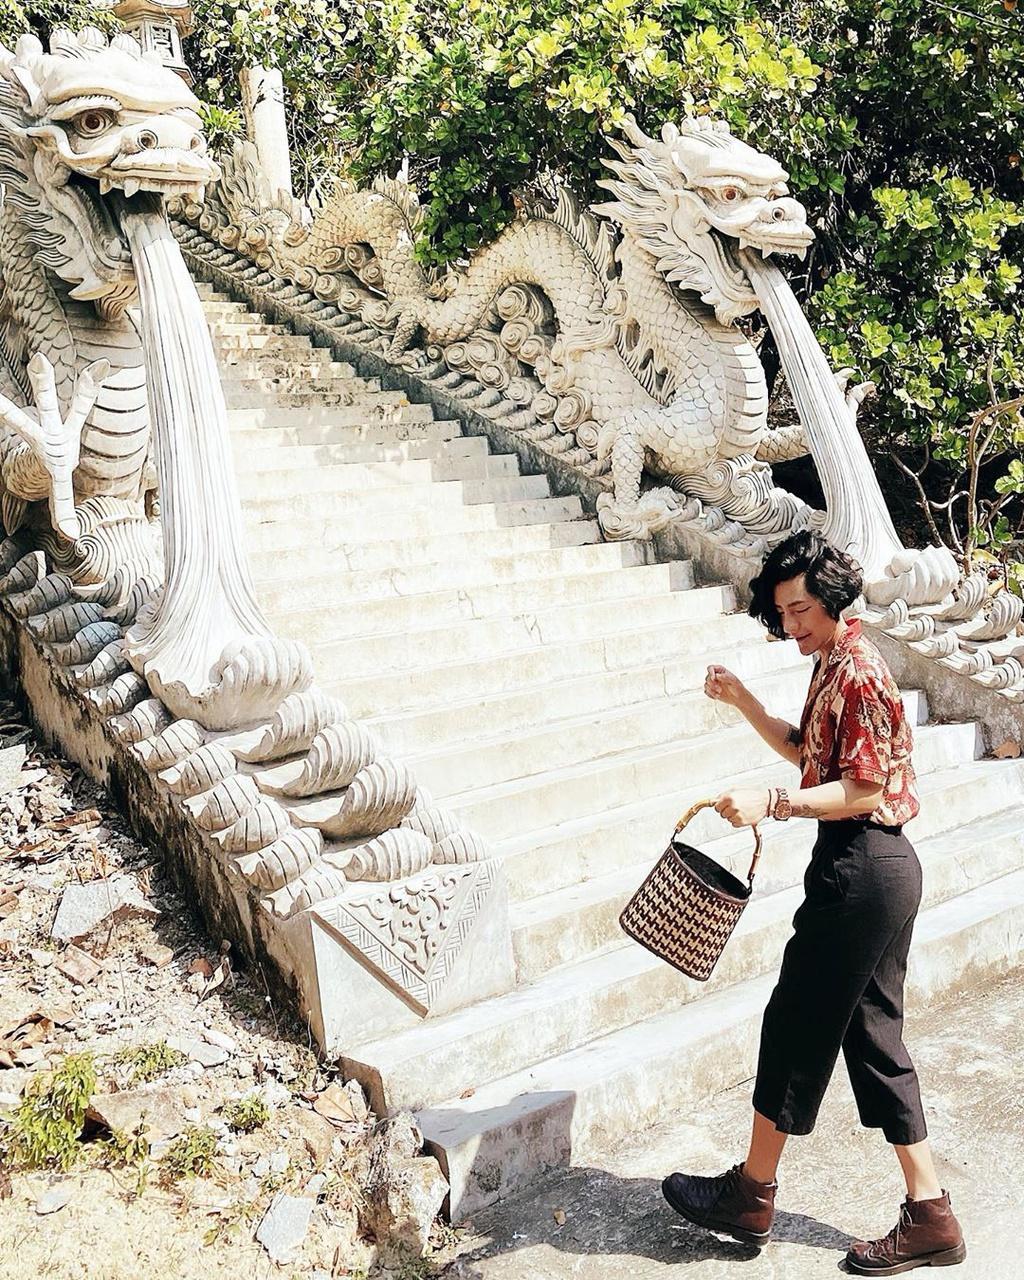 3-ngoi-chua-co-kien-truc-doc-dao-hut-khach-o-khanh-hoa-IVIVU-10